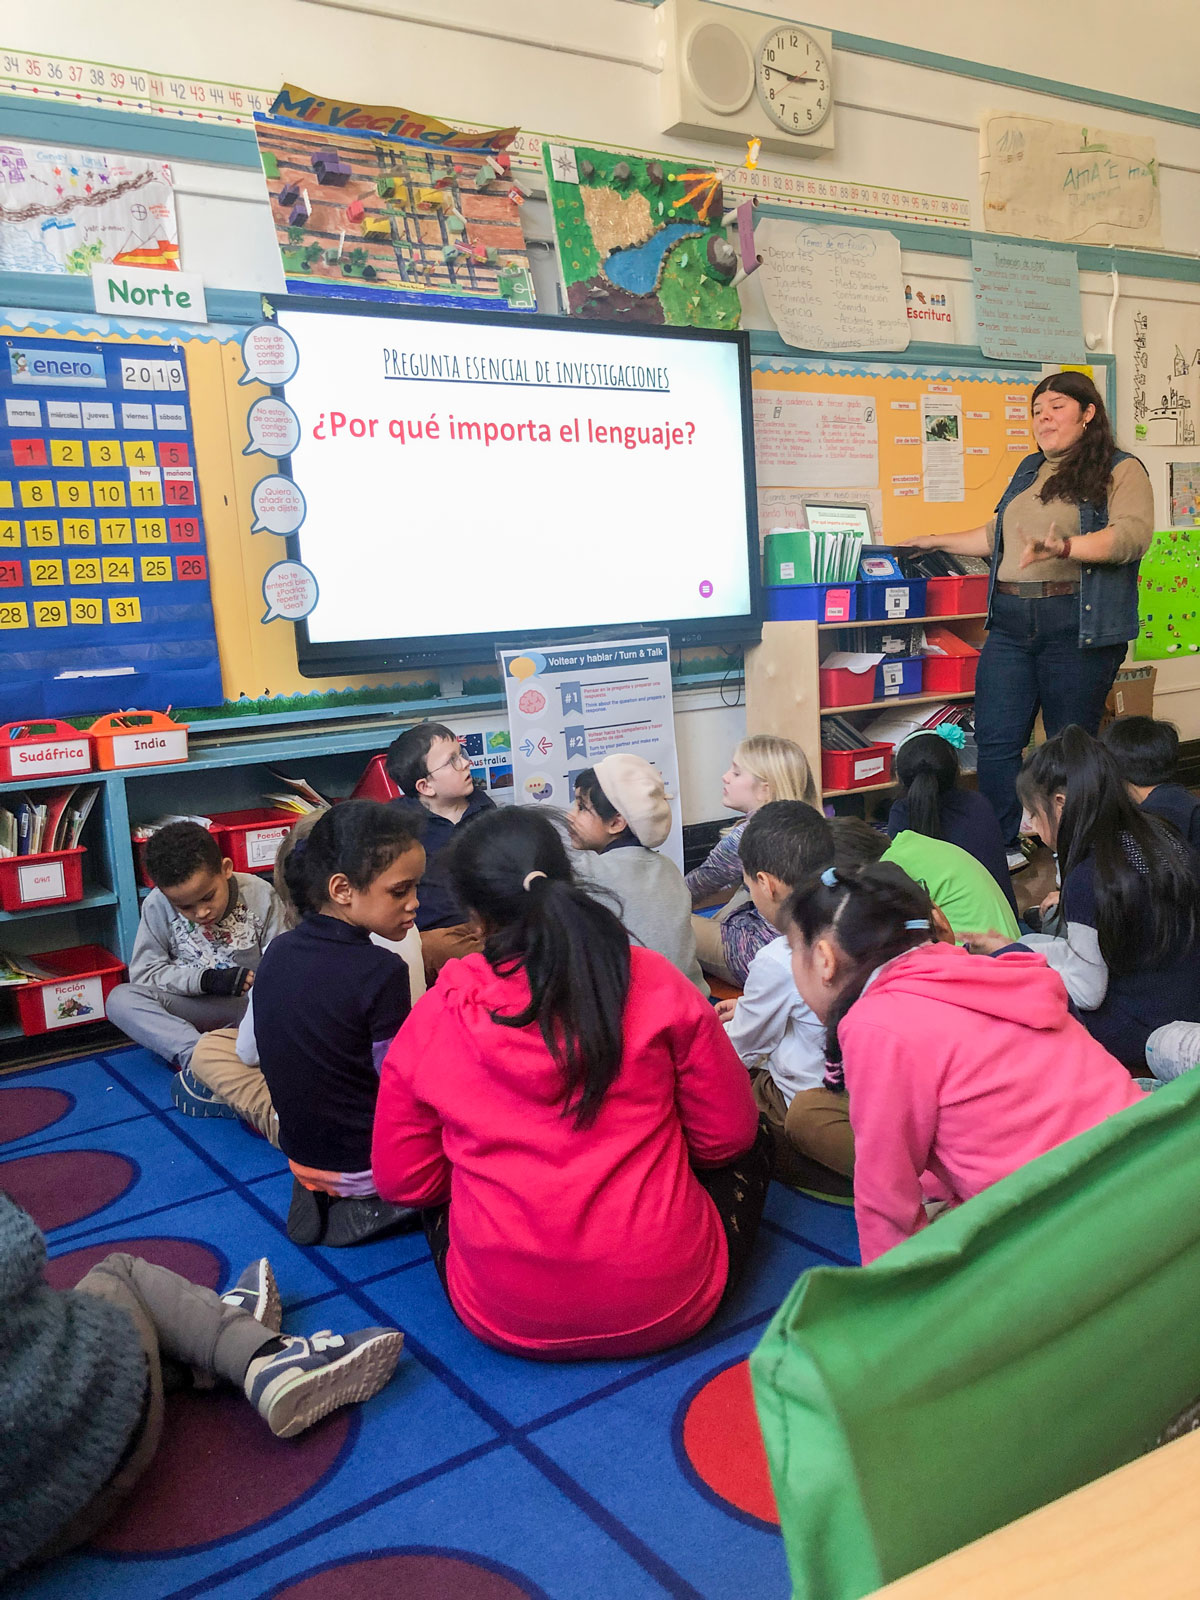 Why does Language Matter? ¿Por qué importa el lenguaje?